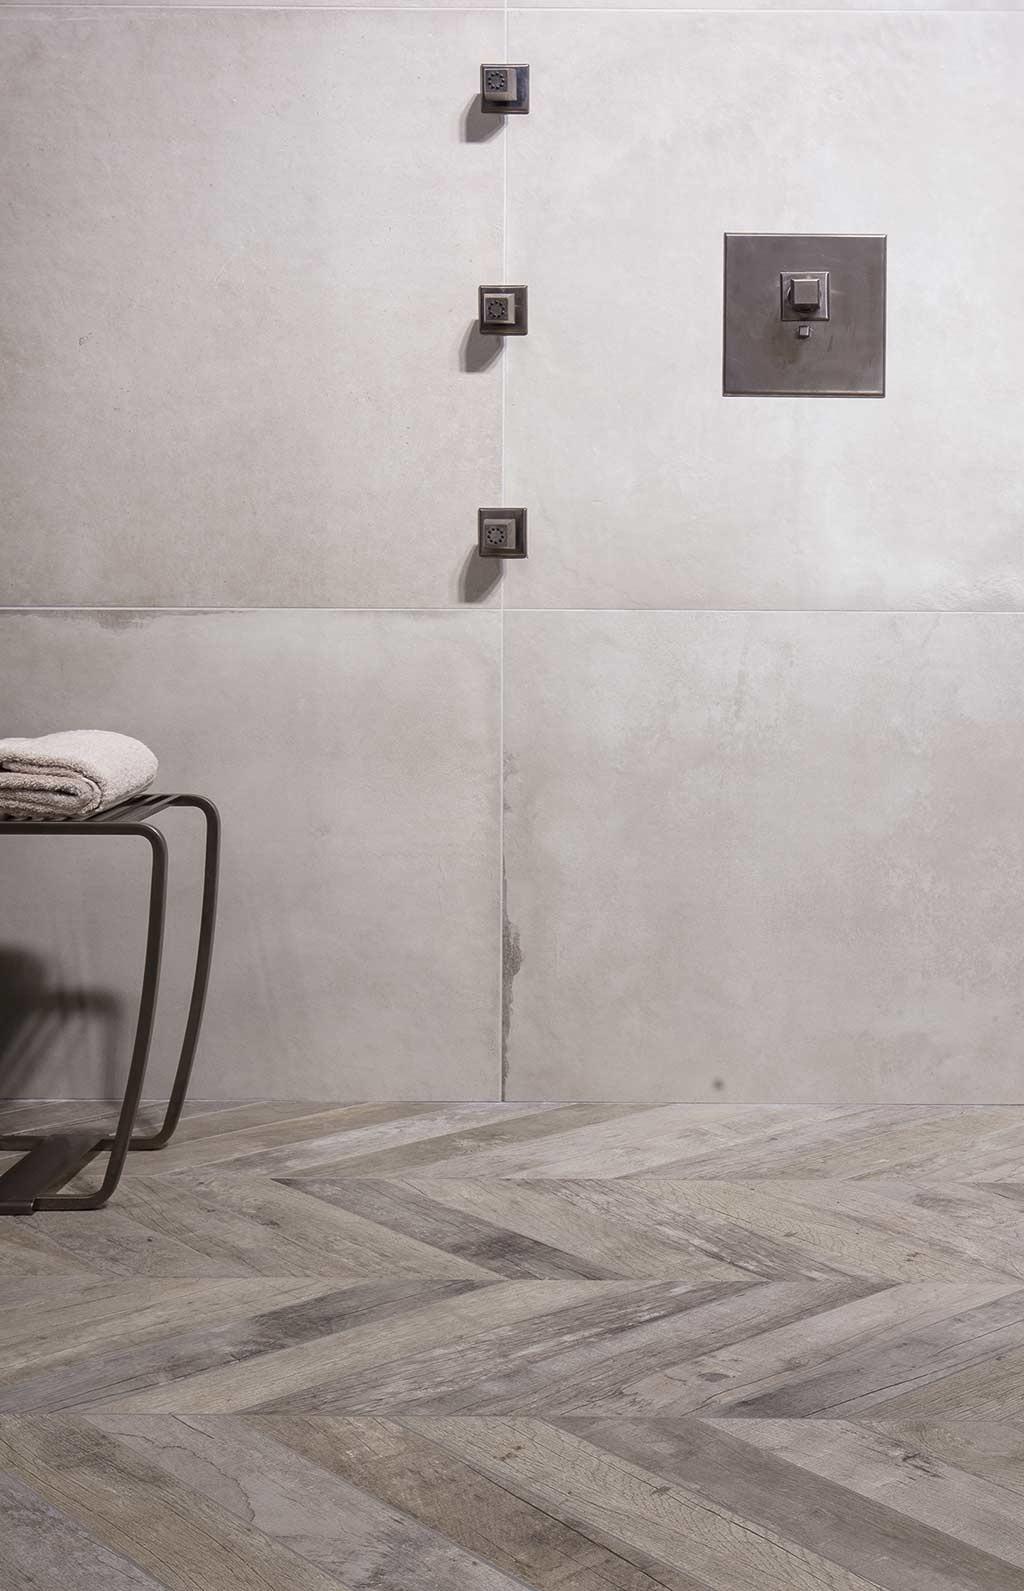 hardwood floor over concrete of visions by rex rex porcelain tiles florim ceramiche s p a regarding out of opposites decorative creativity is unleashed